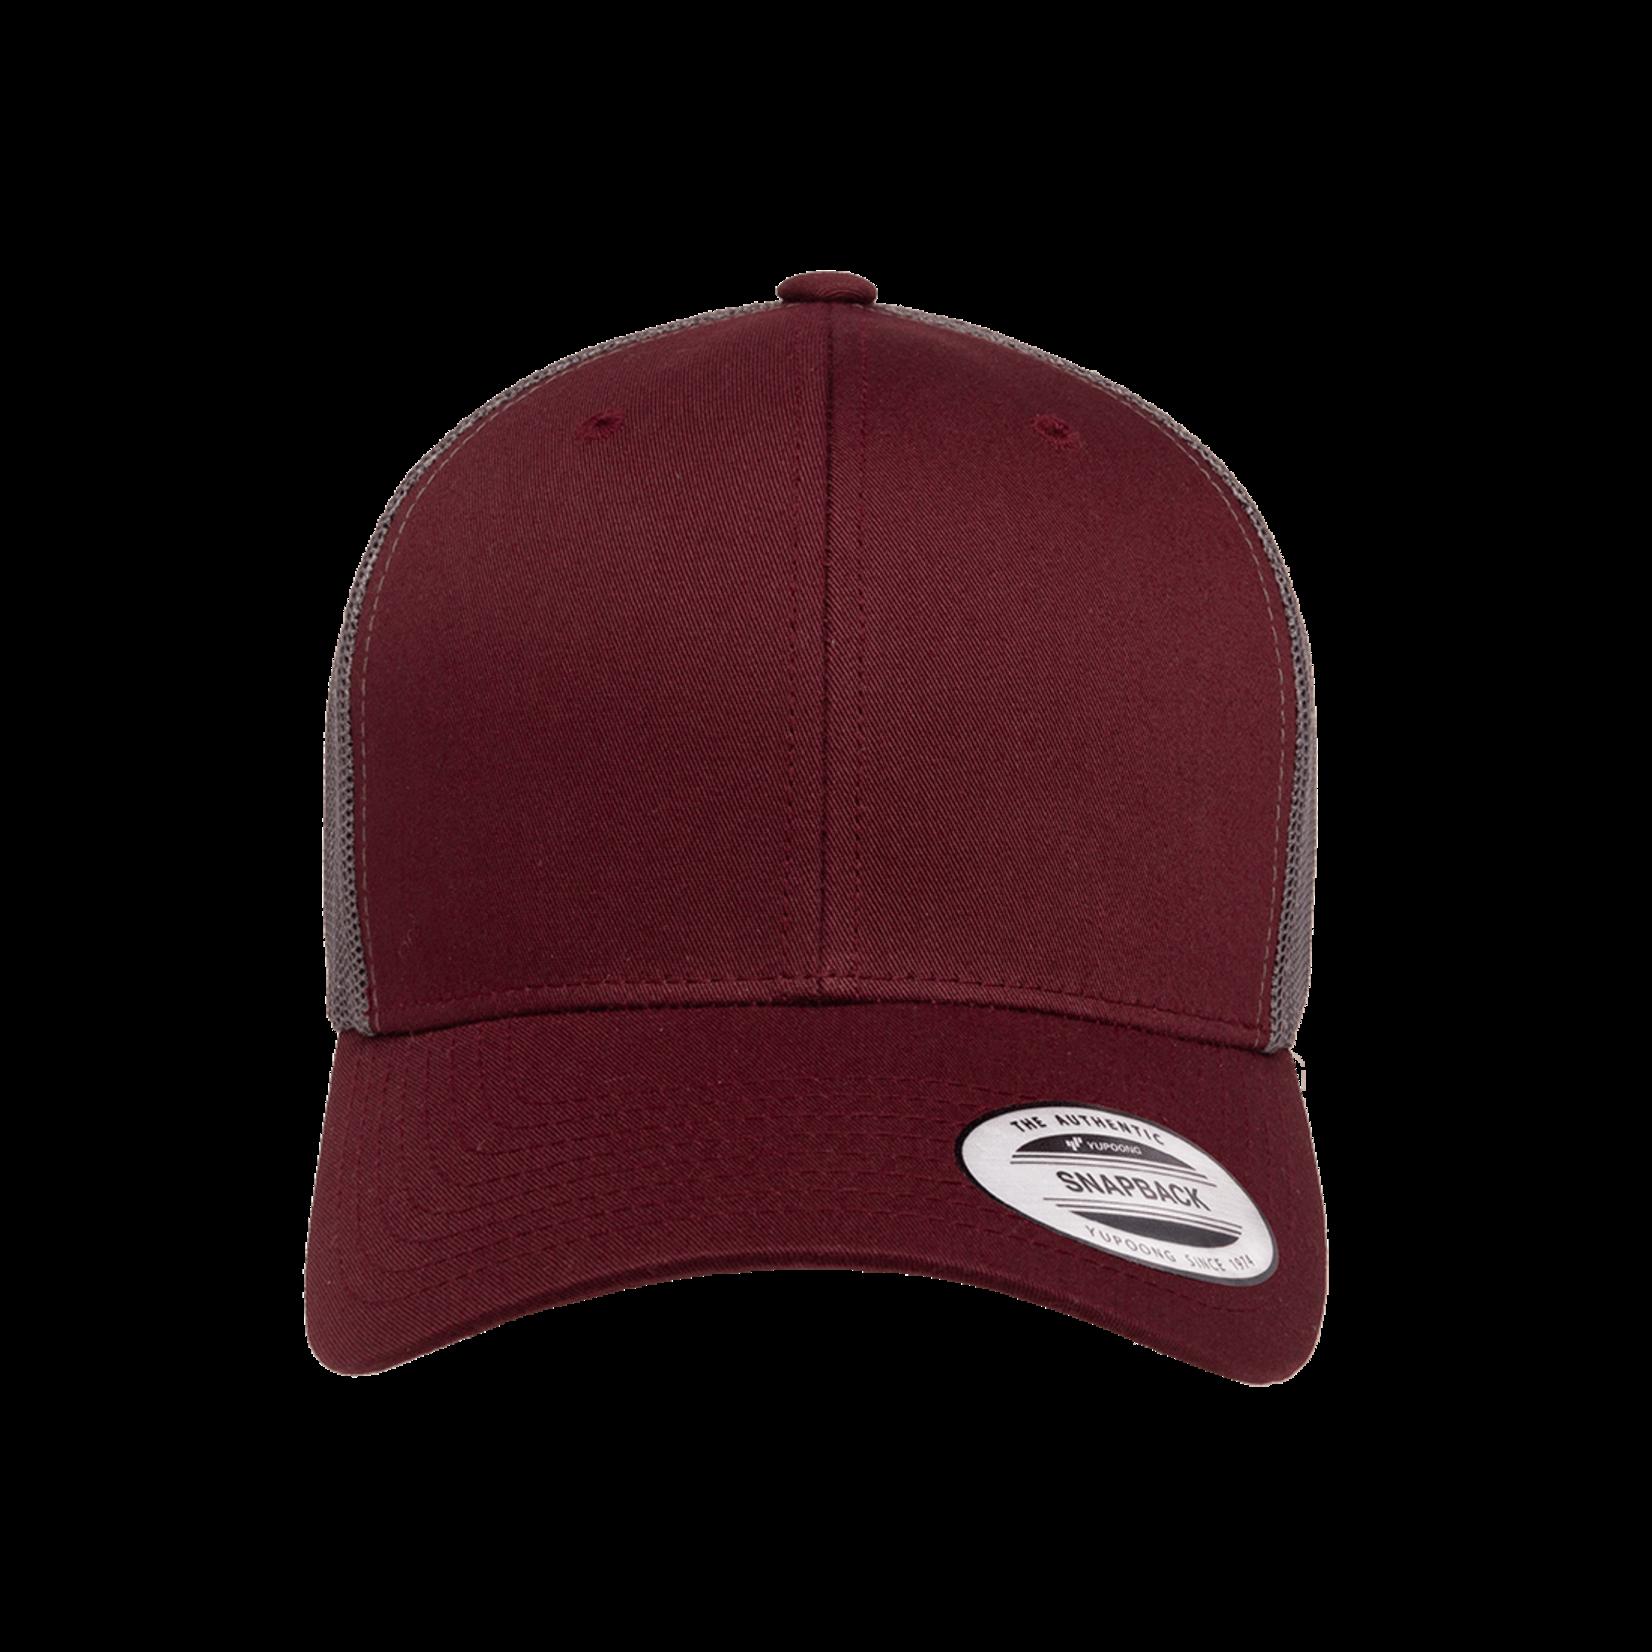 Flexfit Flexfit 6606T 2-Tone Snapback Trucker Hat - Maroon/Grey